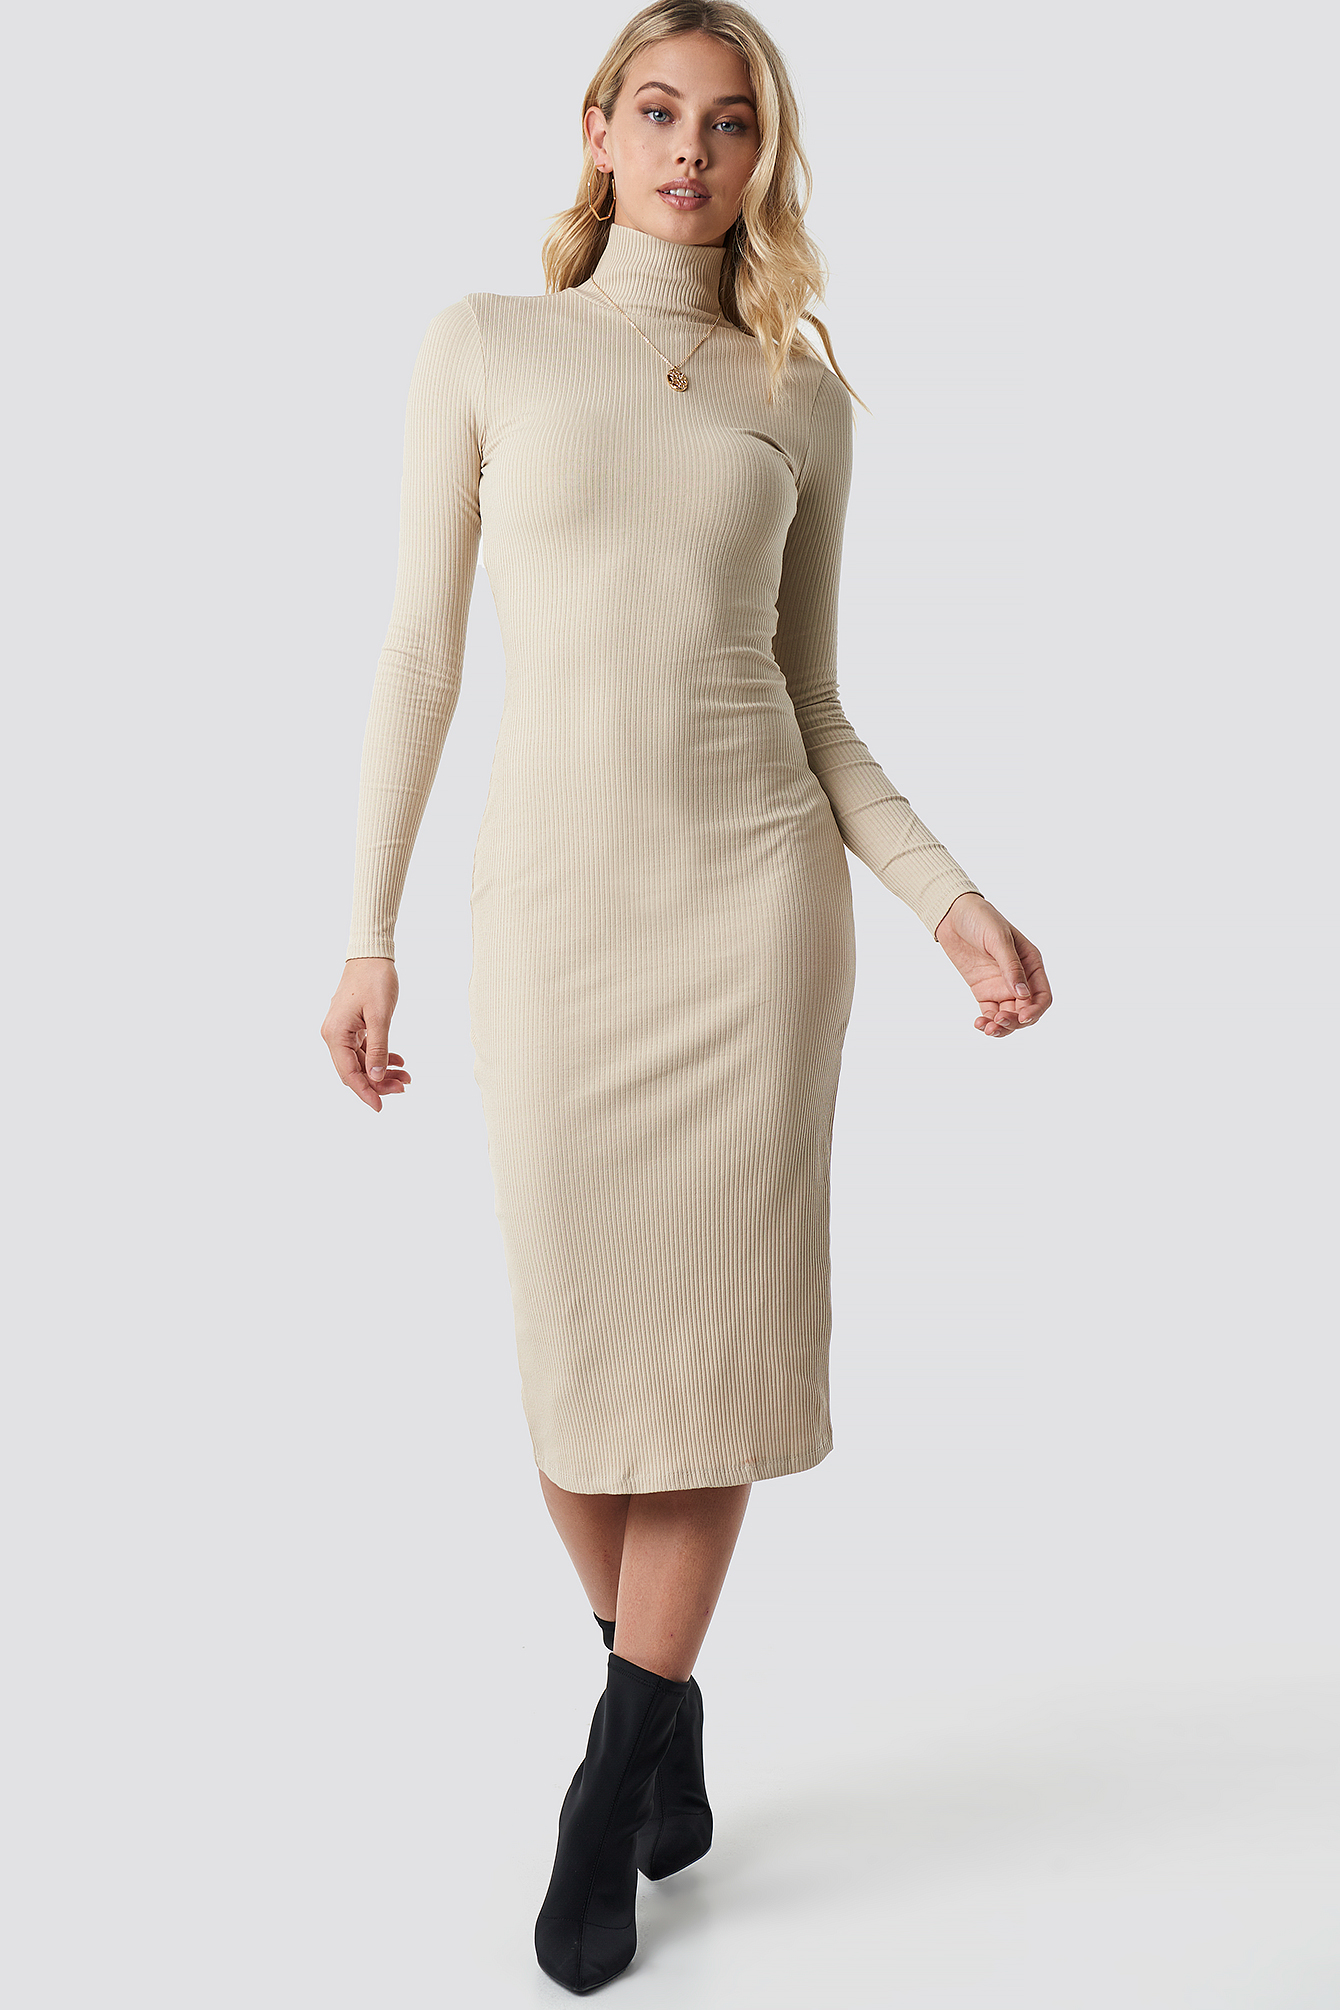 ANNA NOOSHIN X NA-KD High Neck Ribbed Dress - Beige